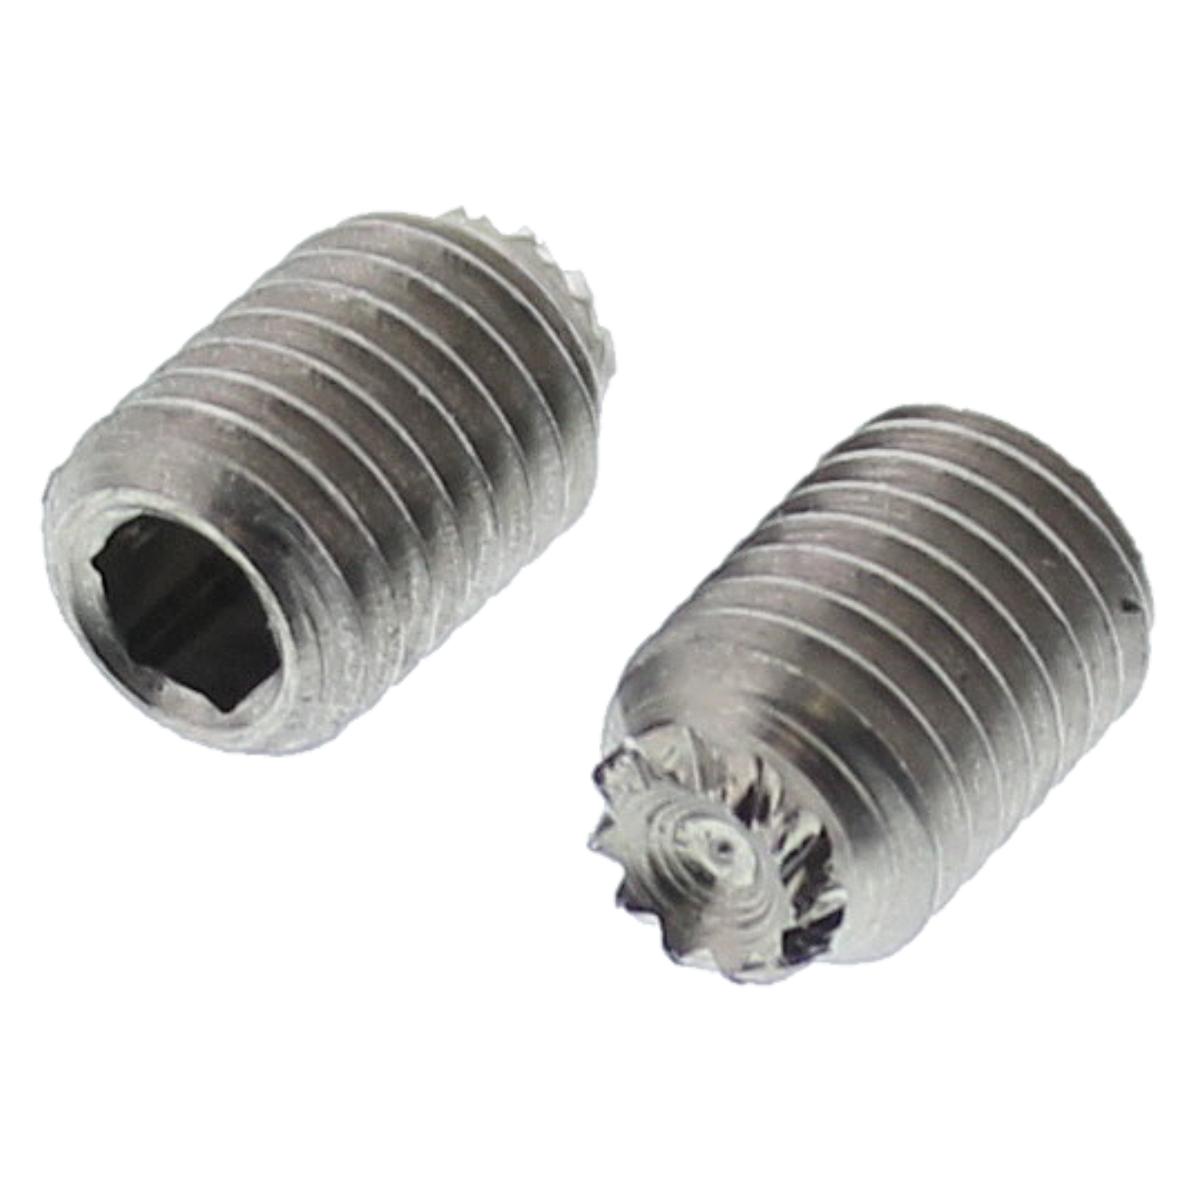 "#10-32 x 1/4"" Socket Set Screws — 18-8 Stainless Steel, Knurled Point - Fine, 100/PKG"